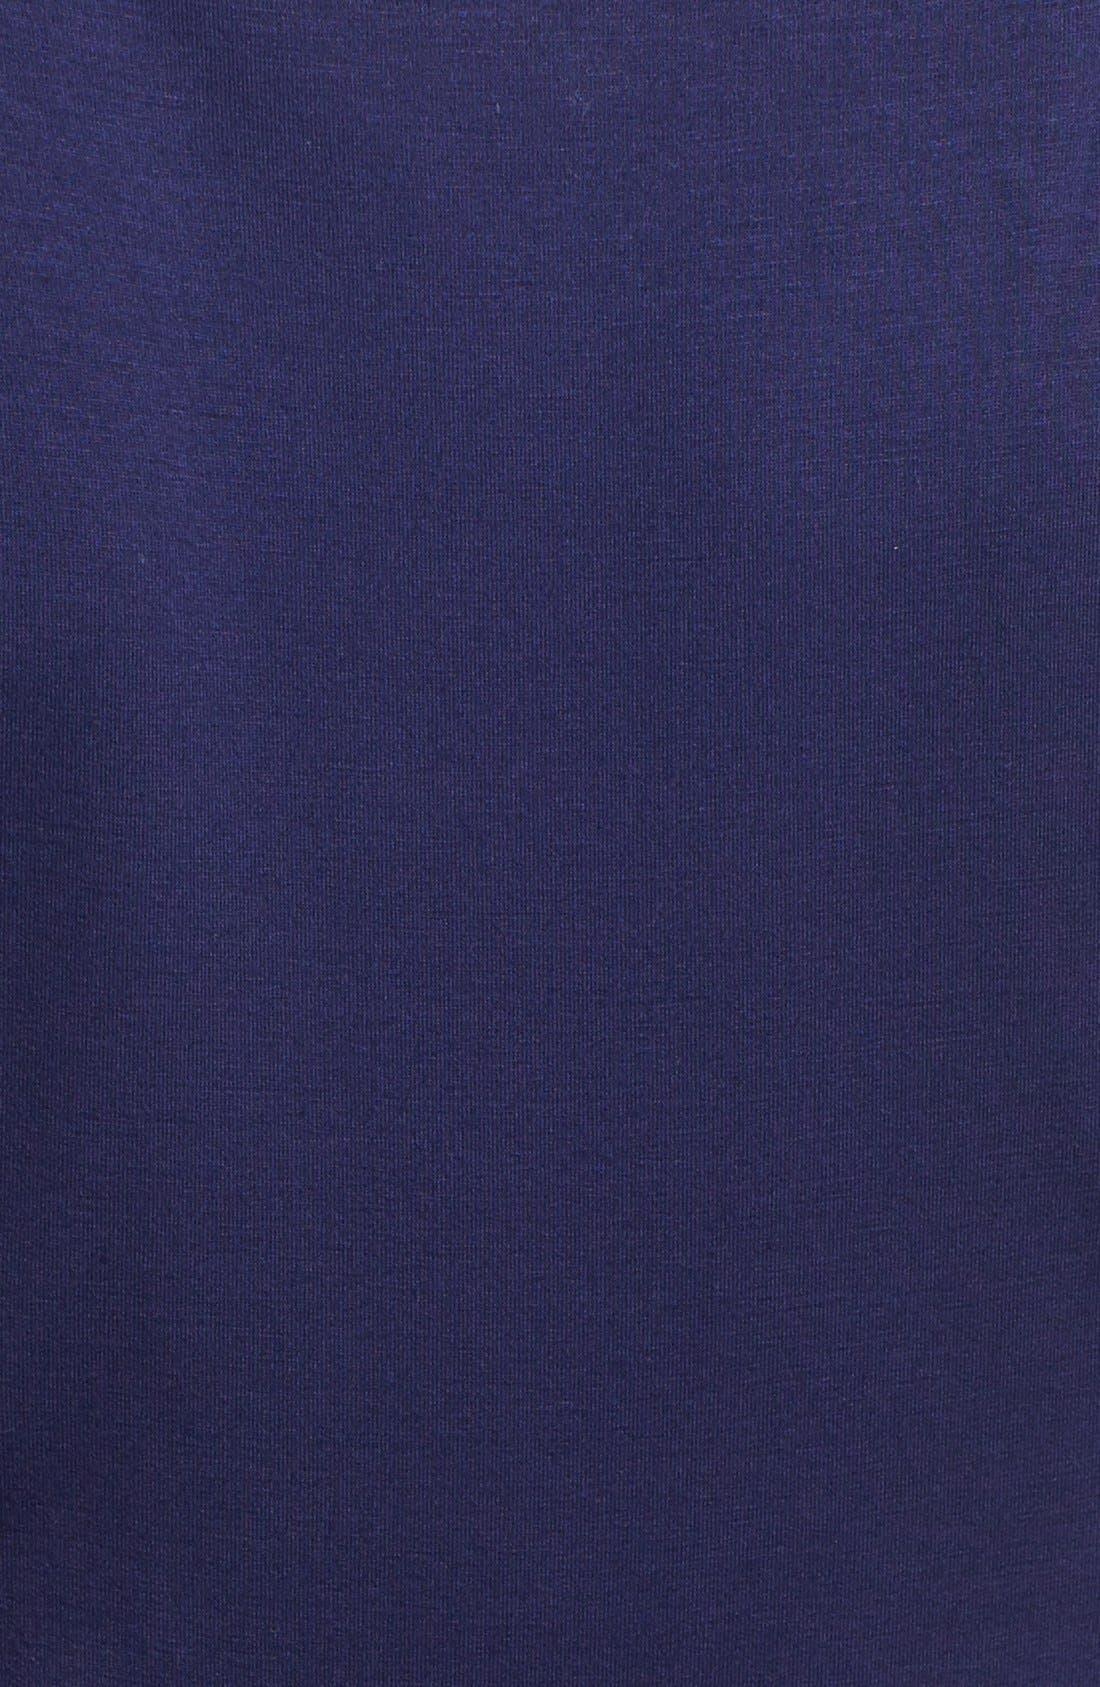 Alternate Image 3  - Three Dots V-Neck Jersey Maxi Dress